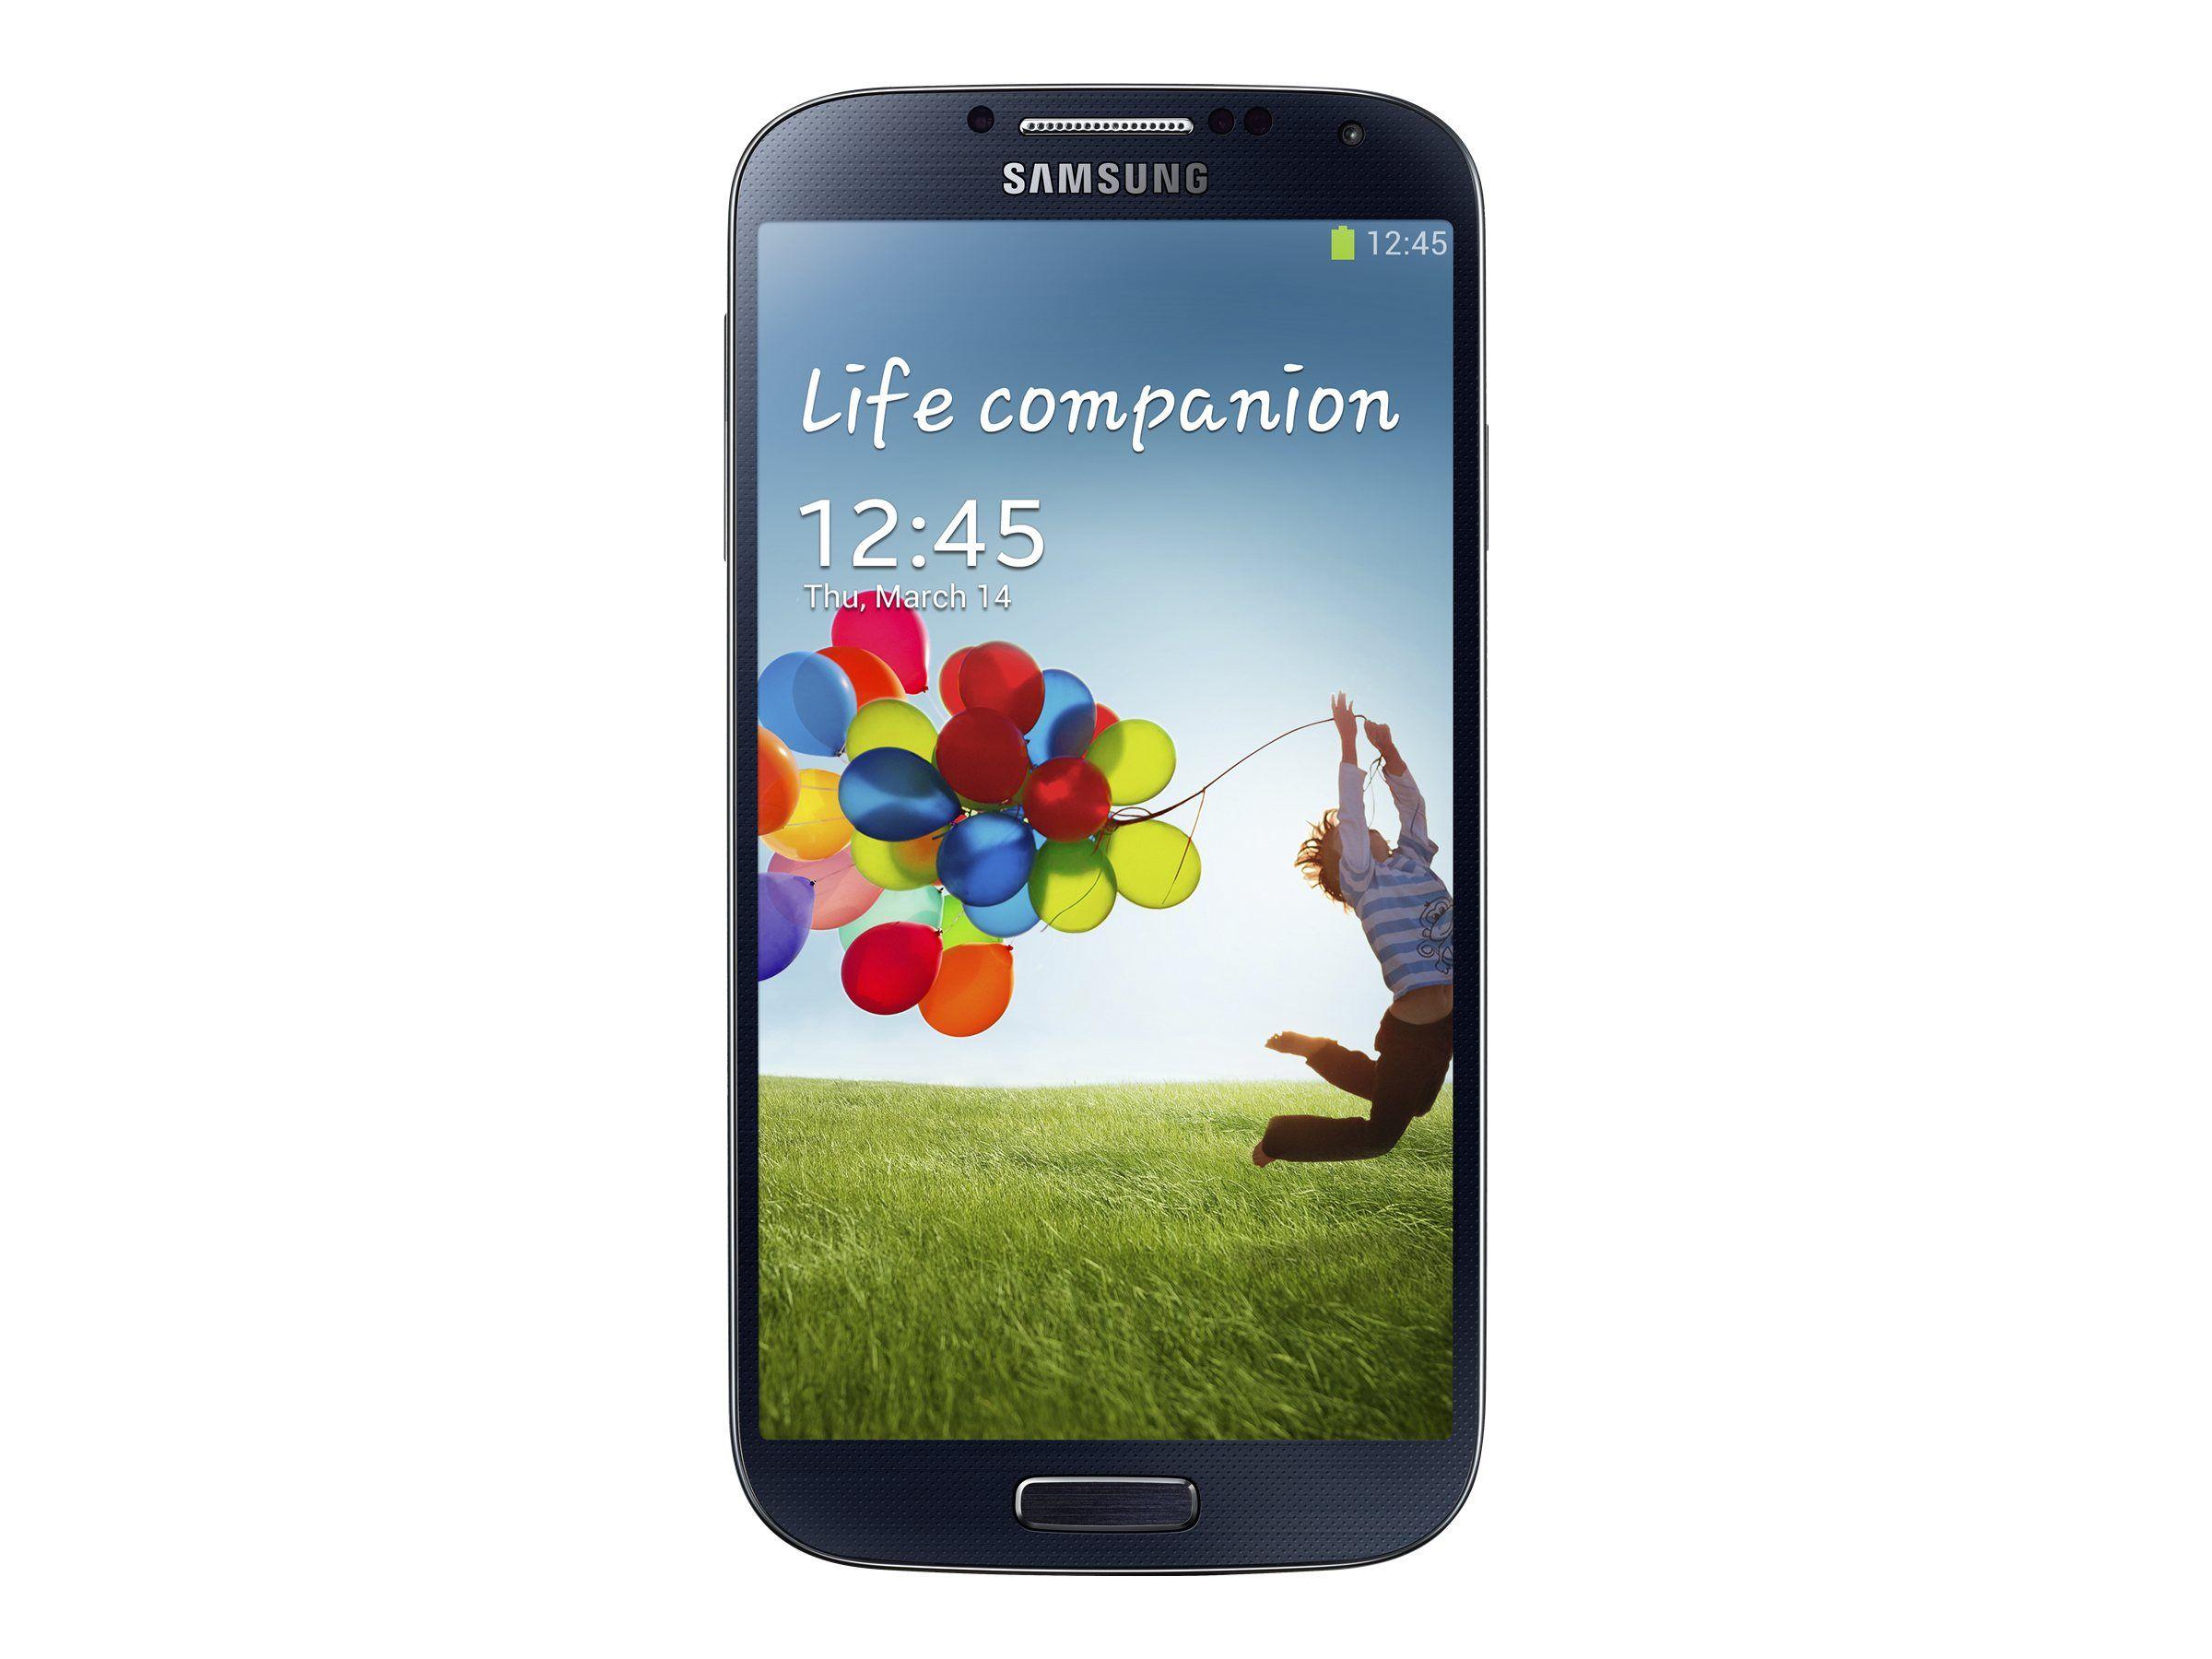 Samsung Galaxy S 4 SGH-M919 - 16GB - Black Mist (T-Mobile) Smartphone